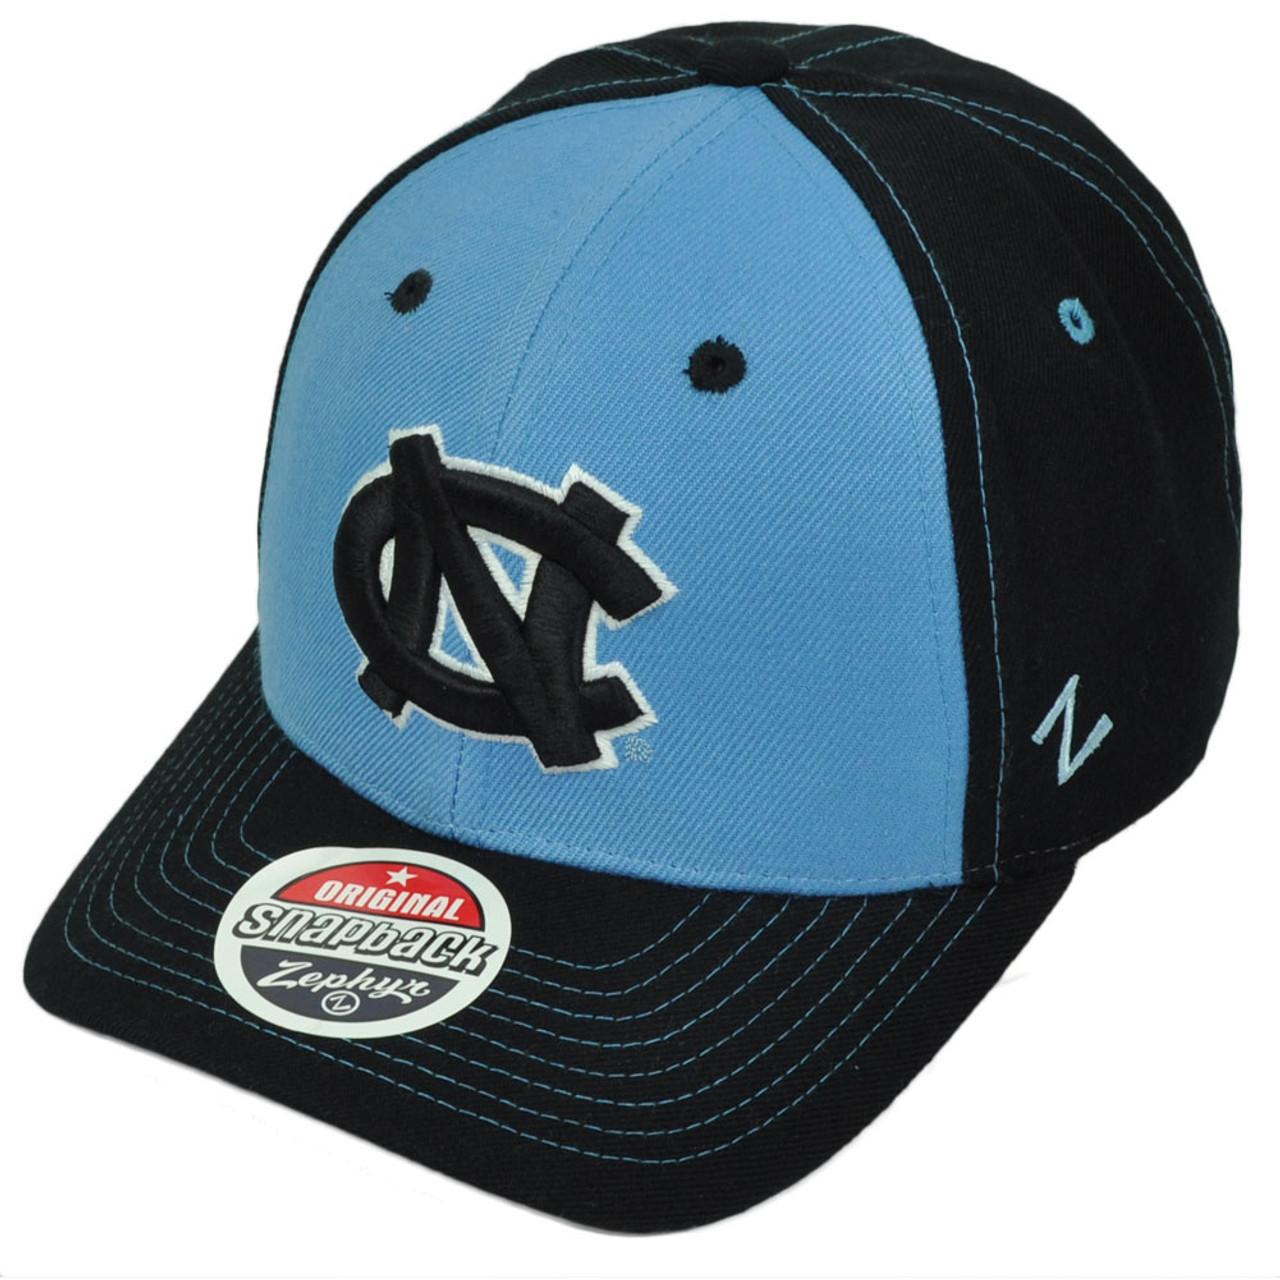 5a33c79433 NCAA Zephyr North Carolina Tar Heels Snapback Hat Cap Navy Blue Curved Bill